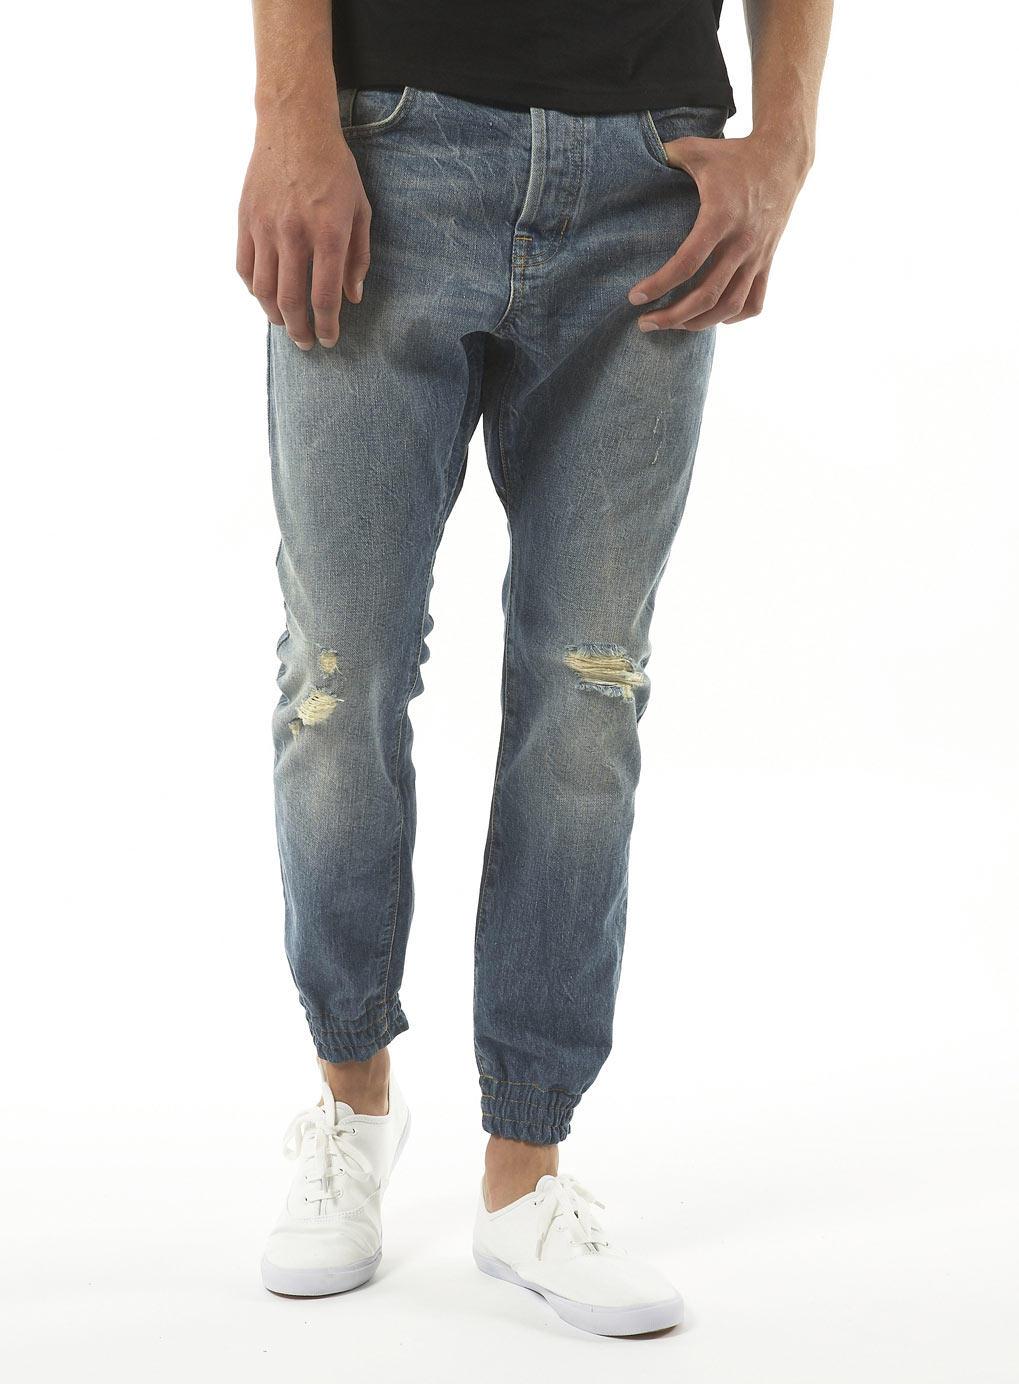 Mens Skinny Fit Jeans